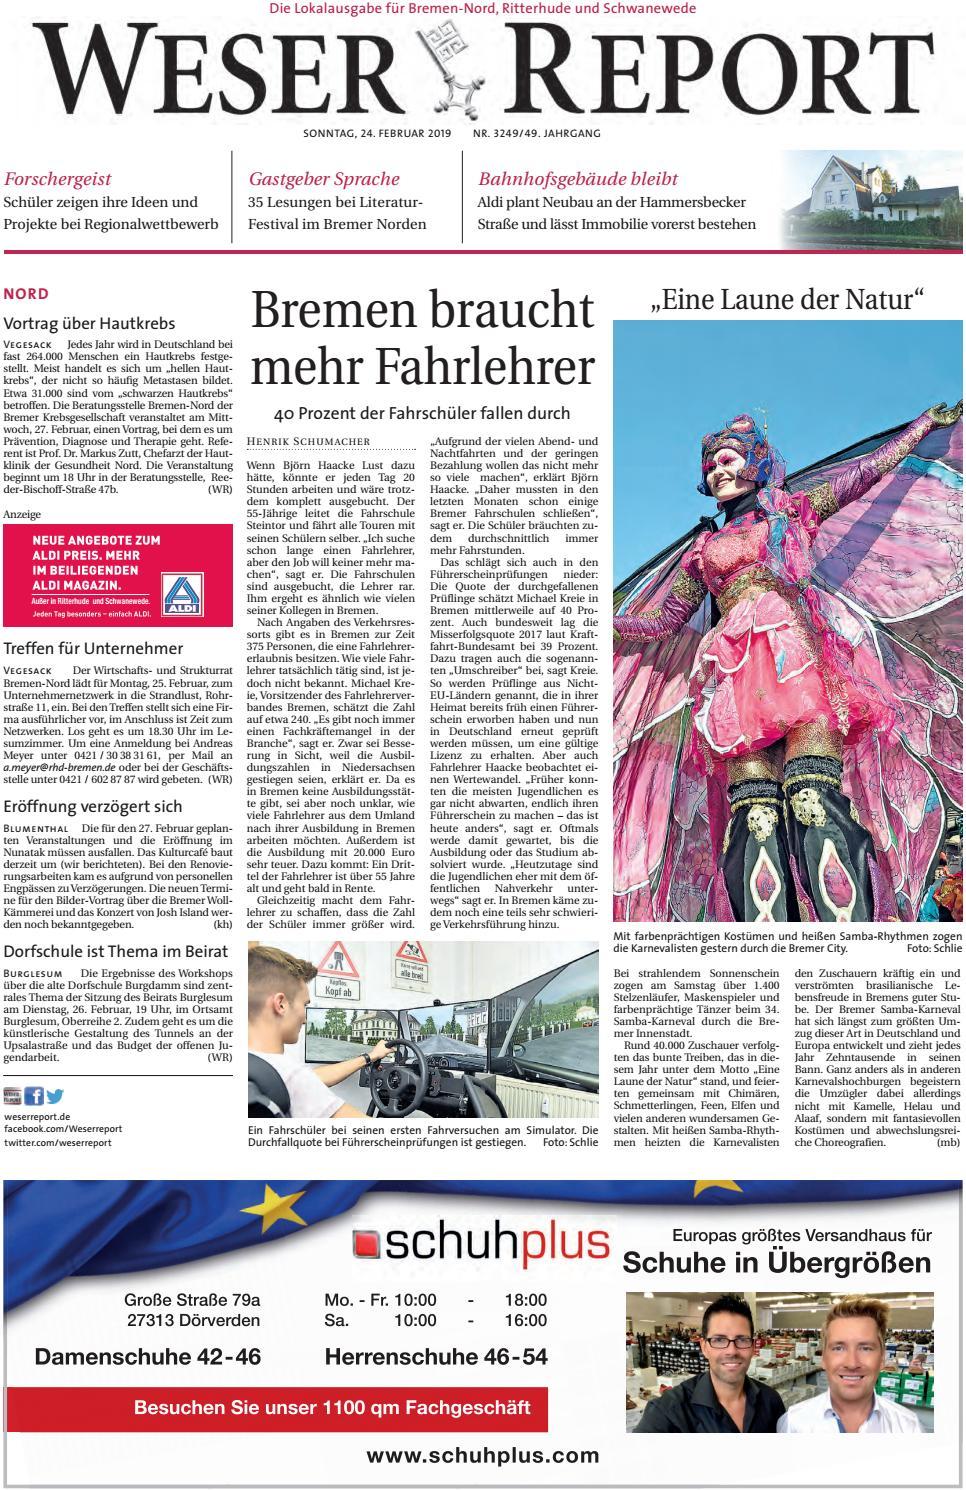 Weser Report Nord Vom 24 02 2019 By Kps Verlagsgesellschaft Mbh